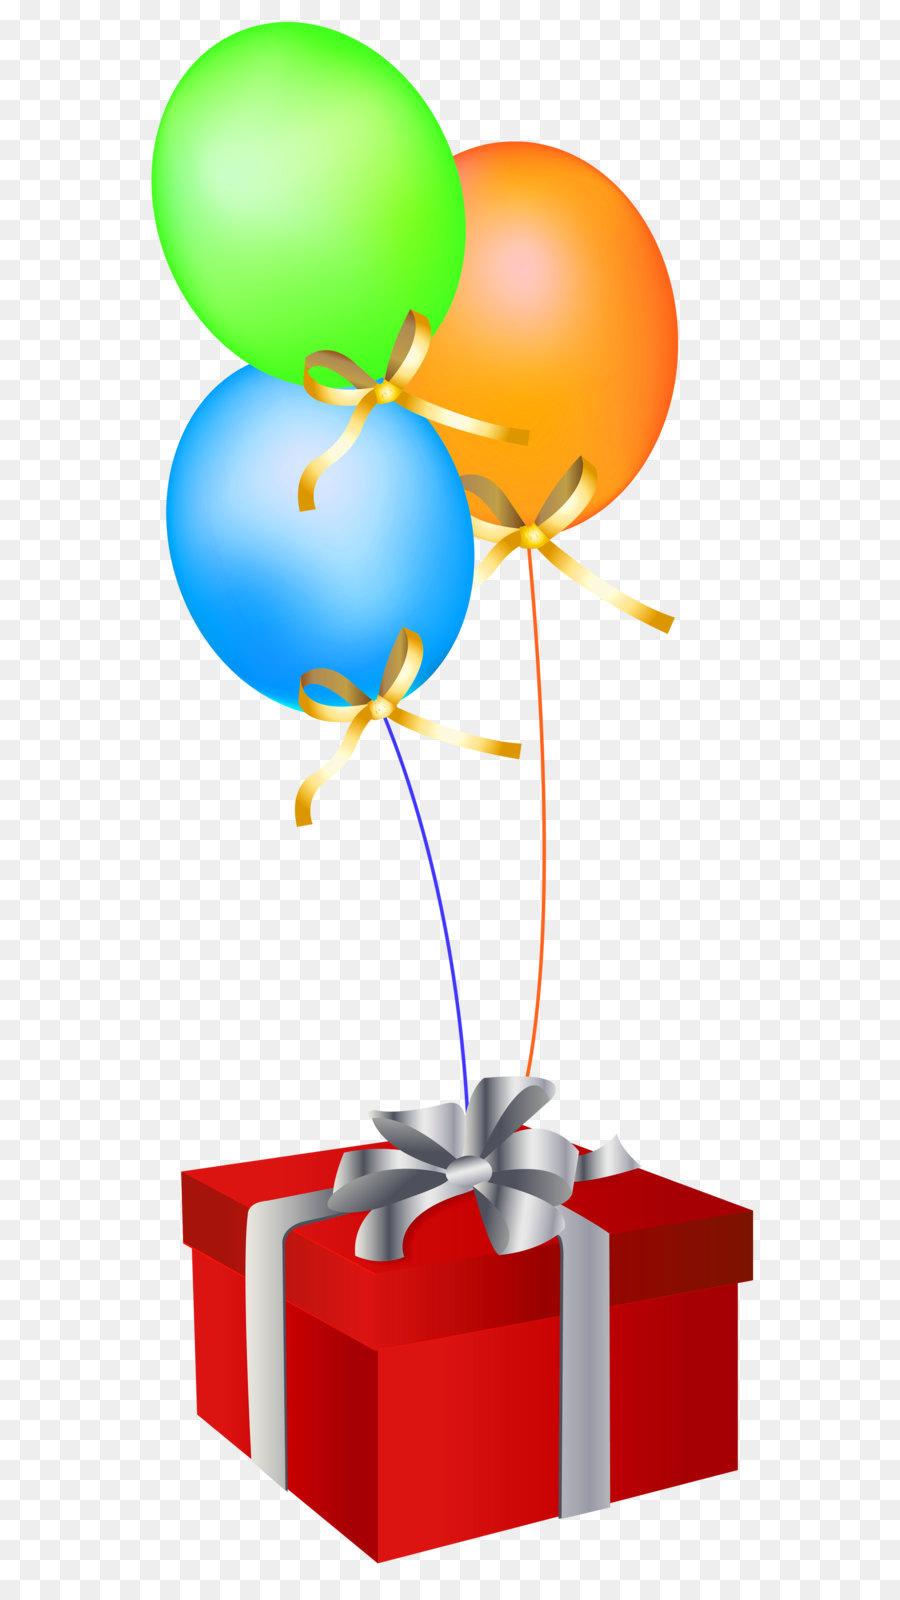 Balloon Gift Birthday Human Behavior Product PNG